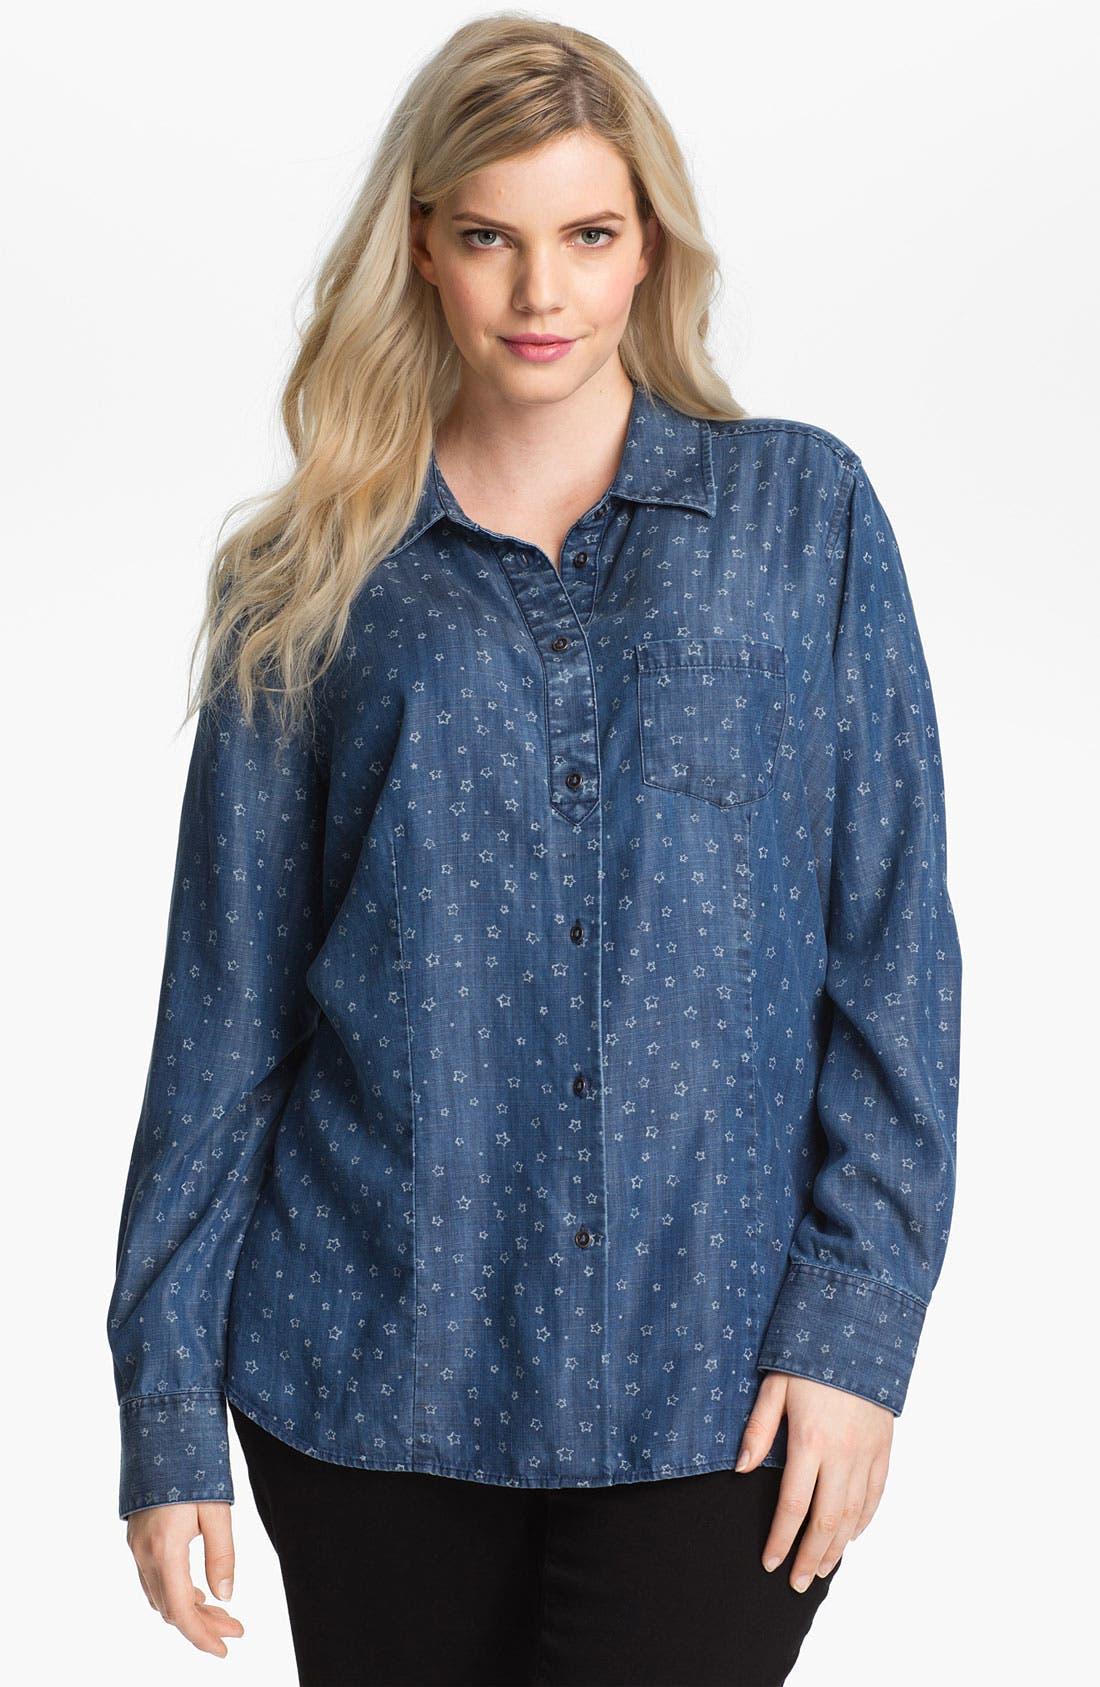 Alternate Image 1 Selected - Shirt 469 Print Cotton Shirt (Plus Size)